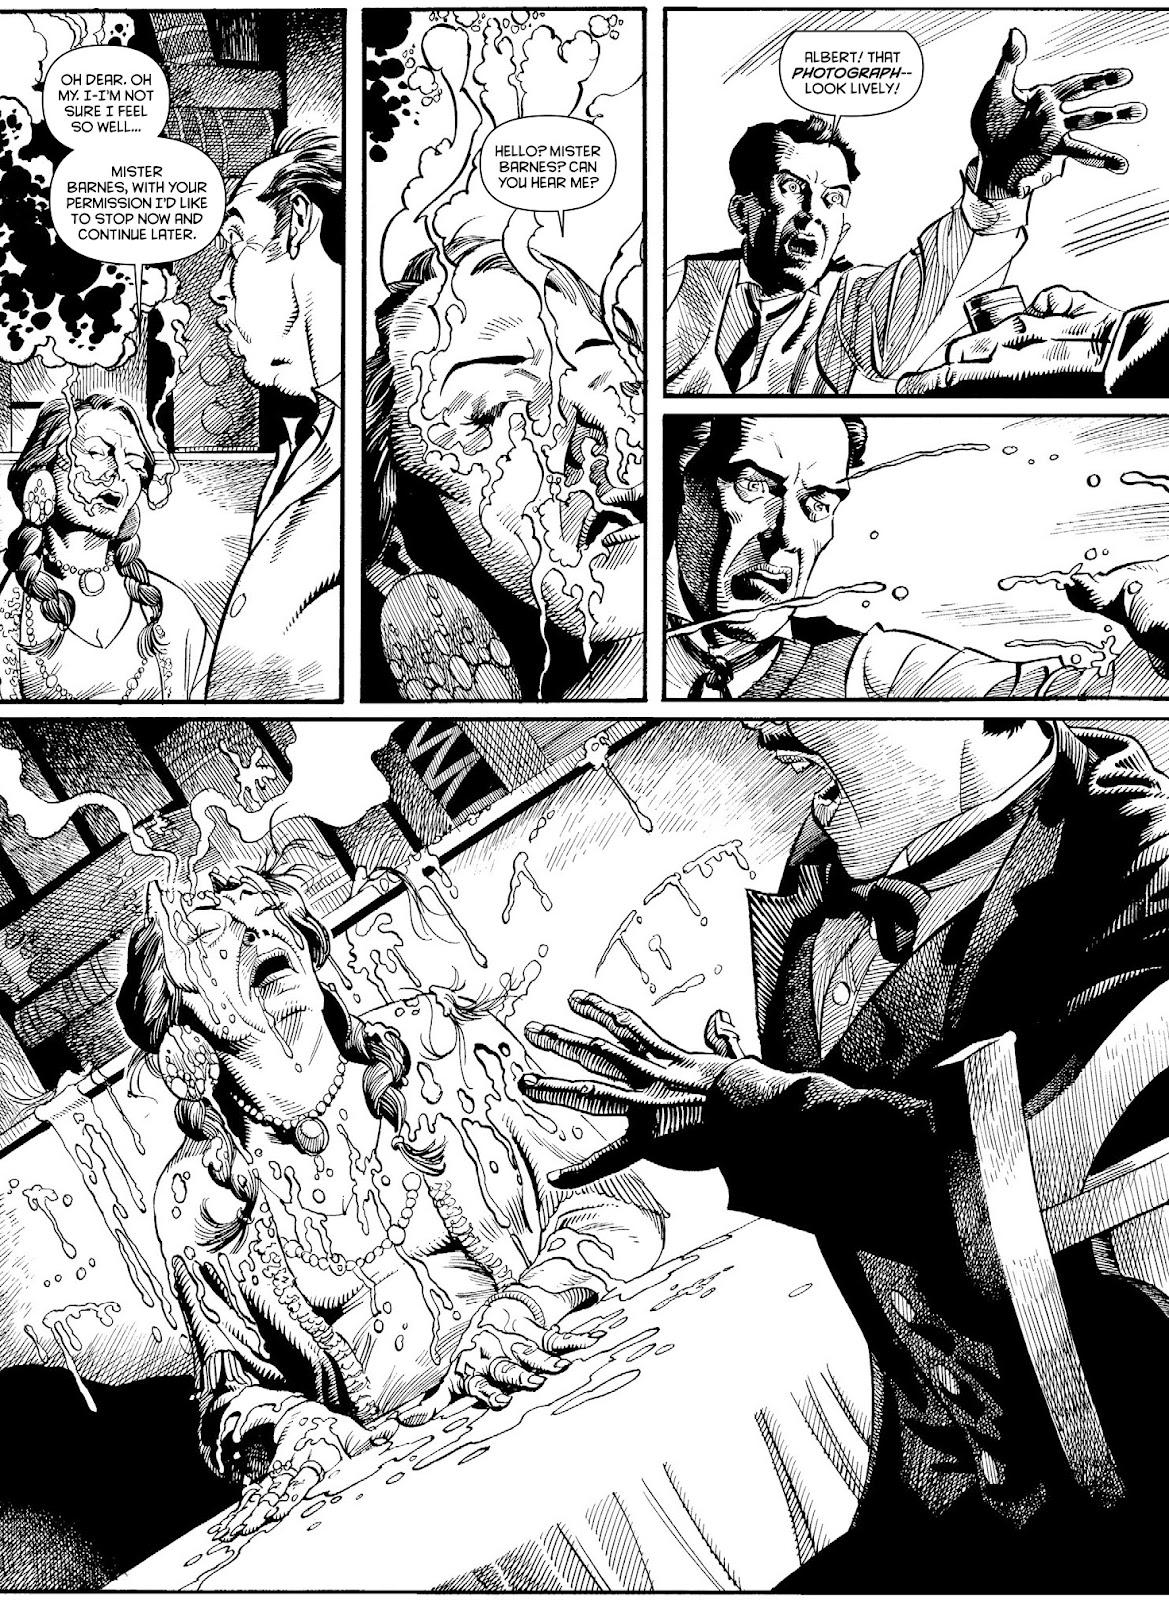 Judge Dredd Megazine (Vol. 5) issue 427 - Page 82